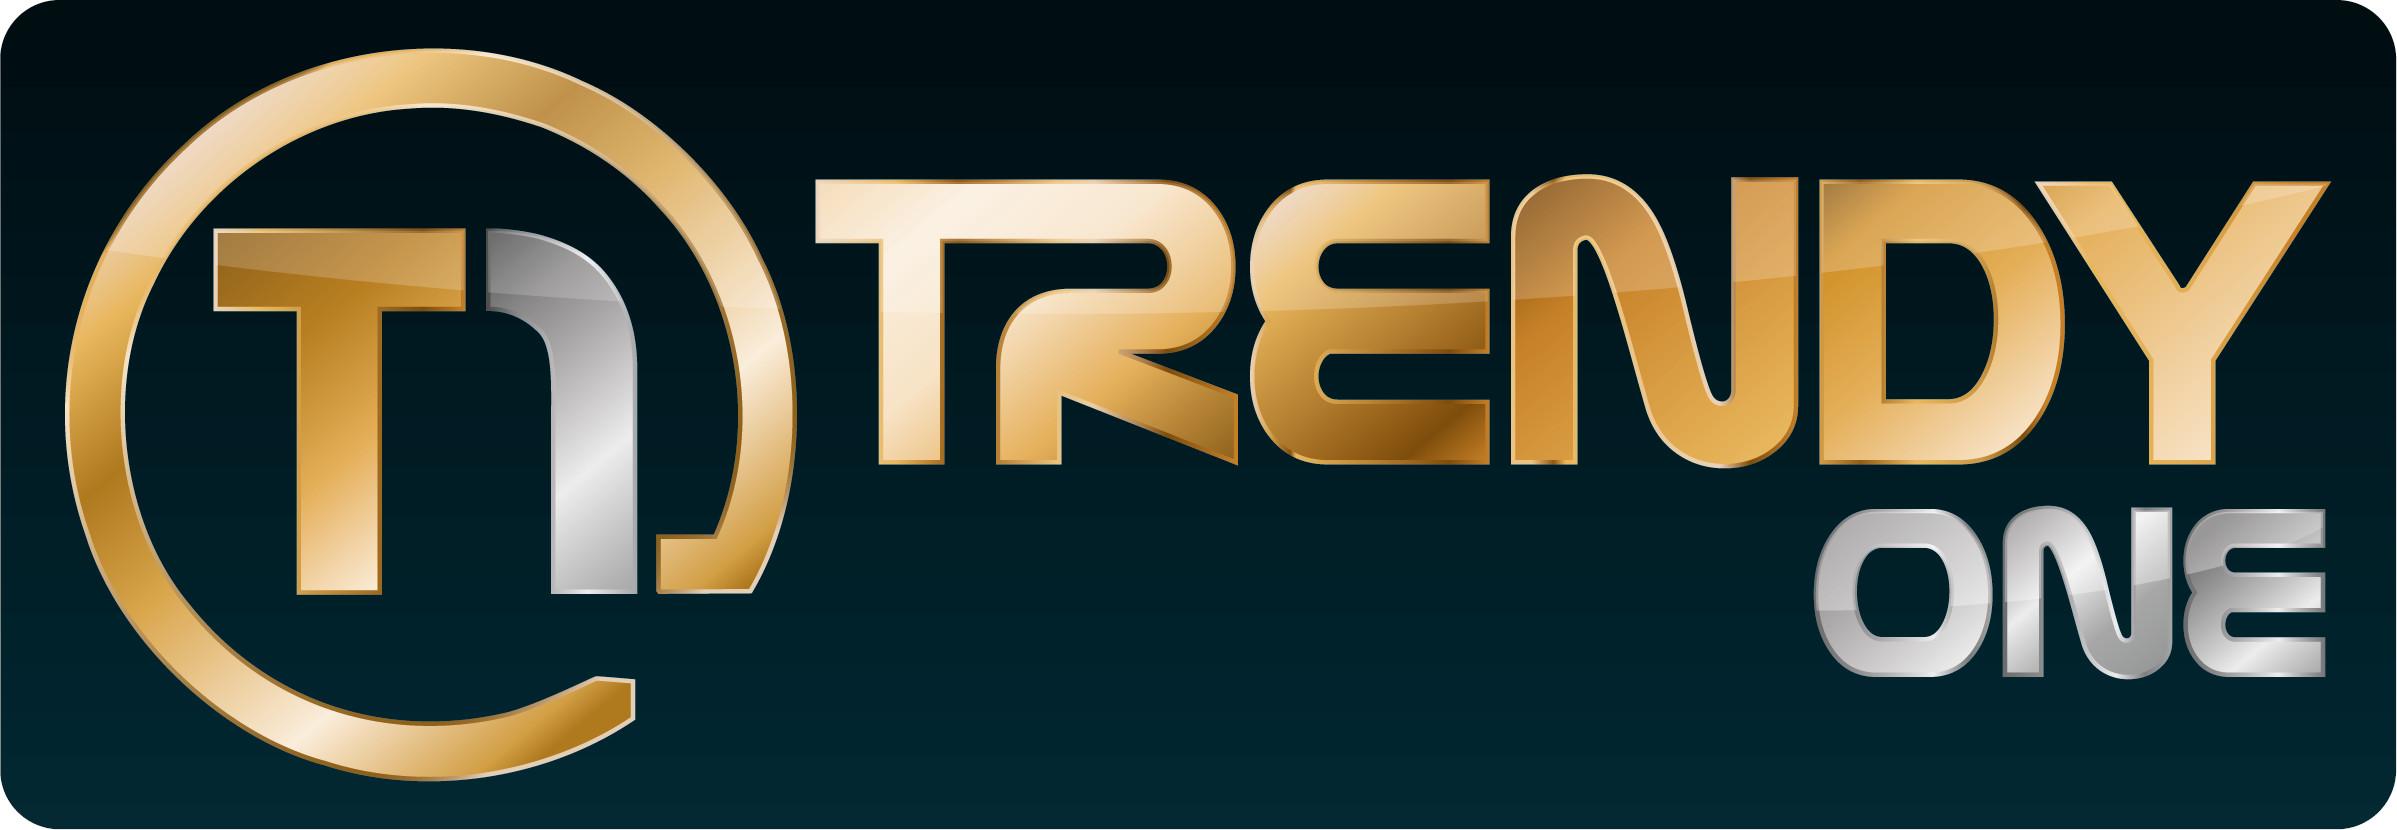 2019 ad can do Gmbh & Co KG trendyone_quer-gold_mit_bg_logo